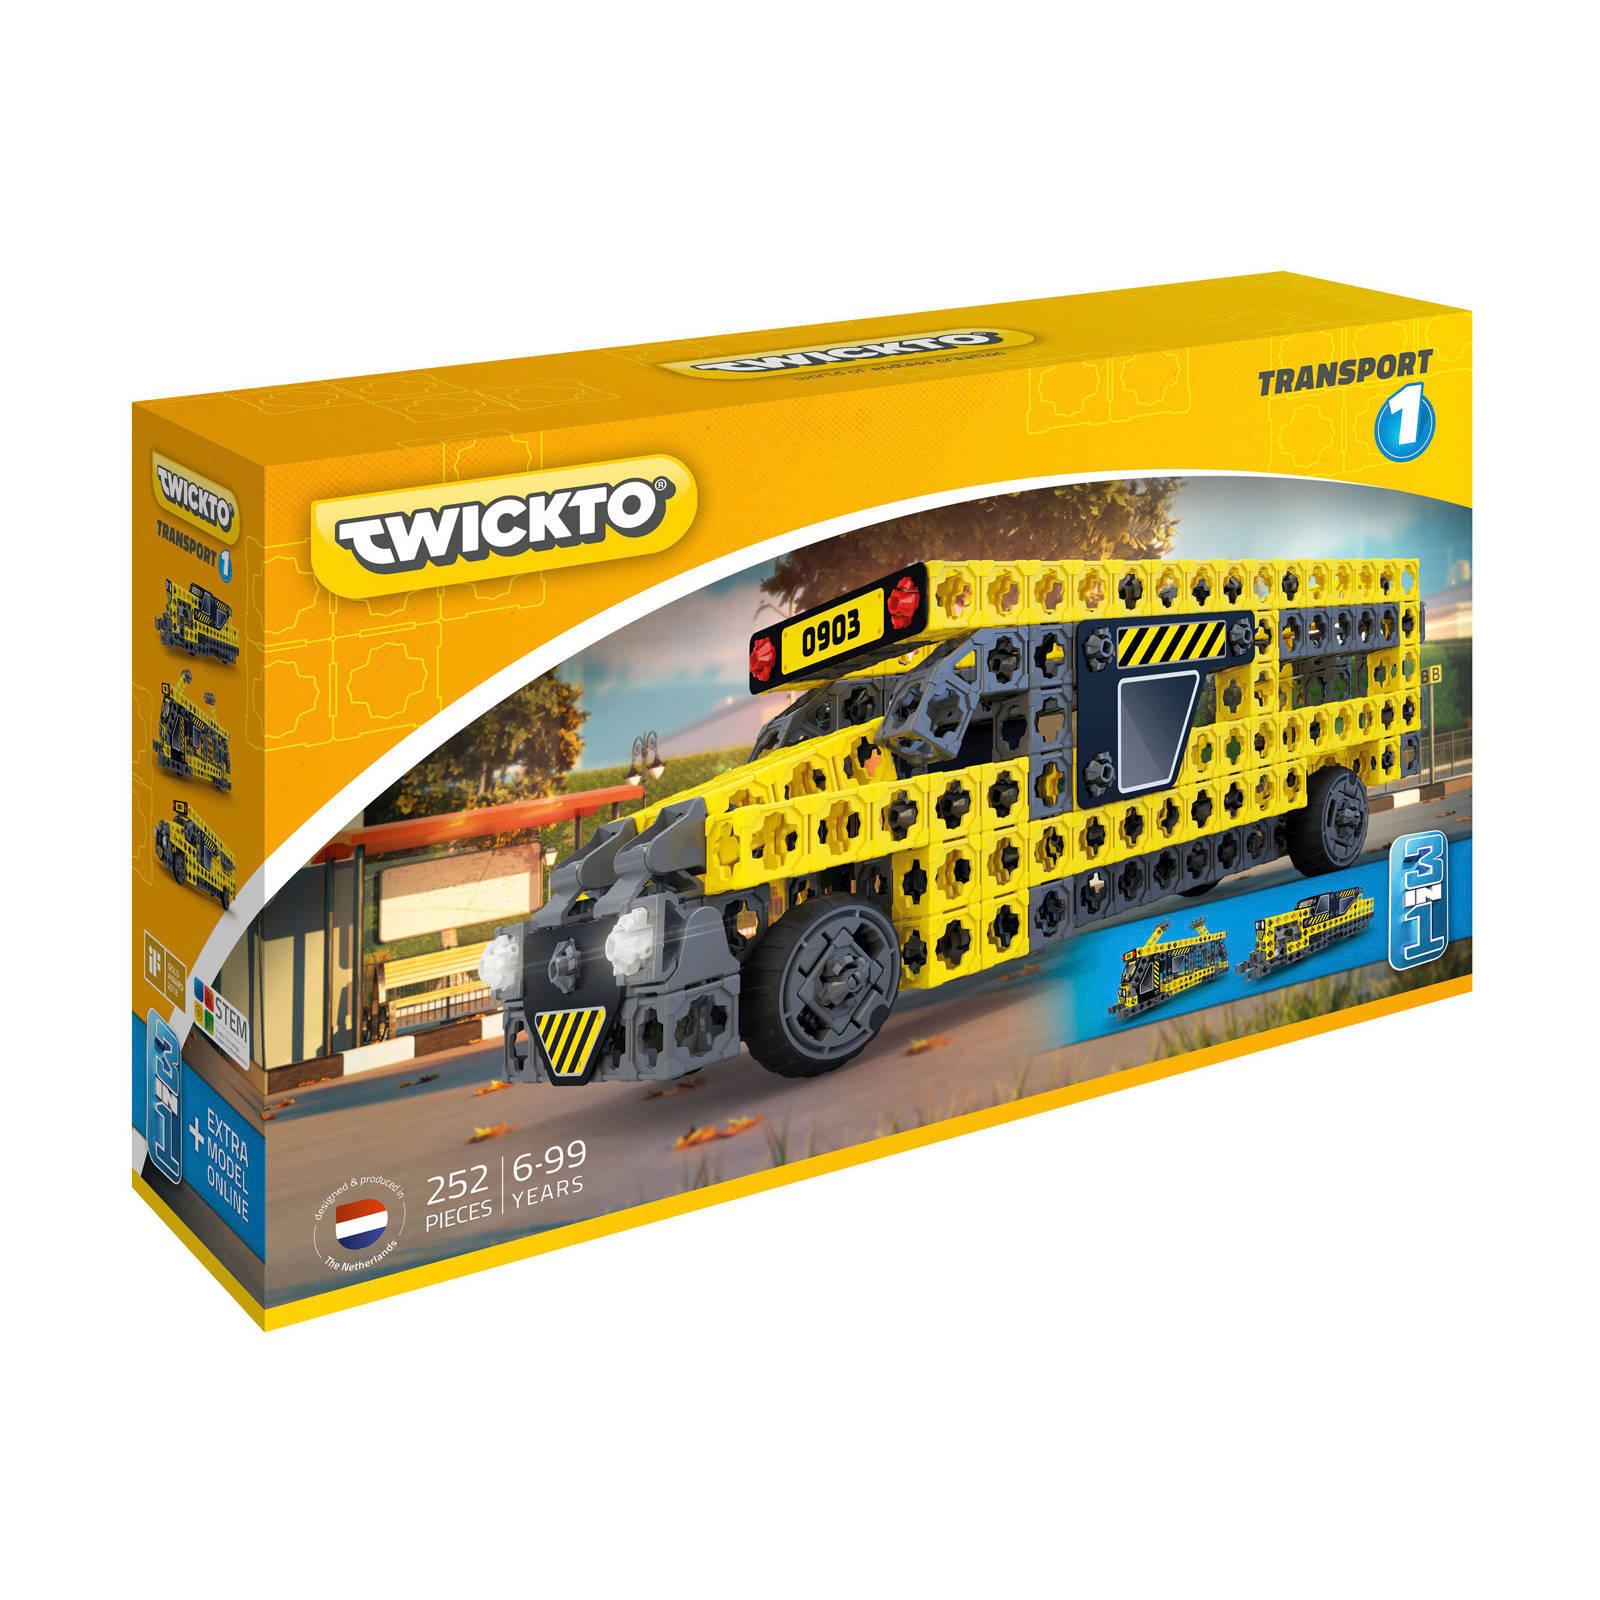 Twickto  Transport #1 252-delig